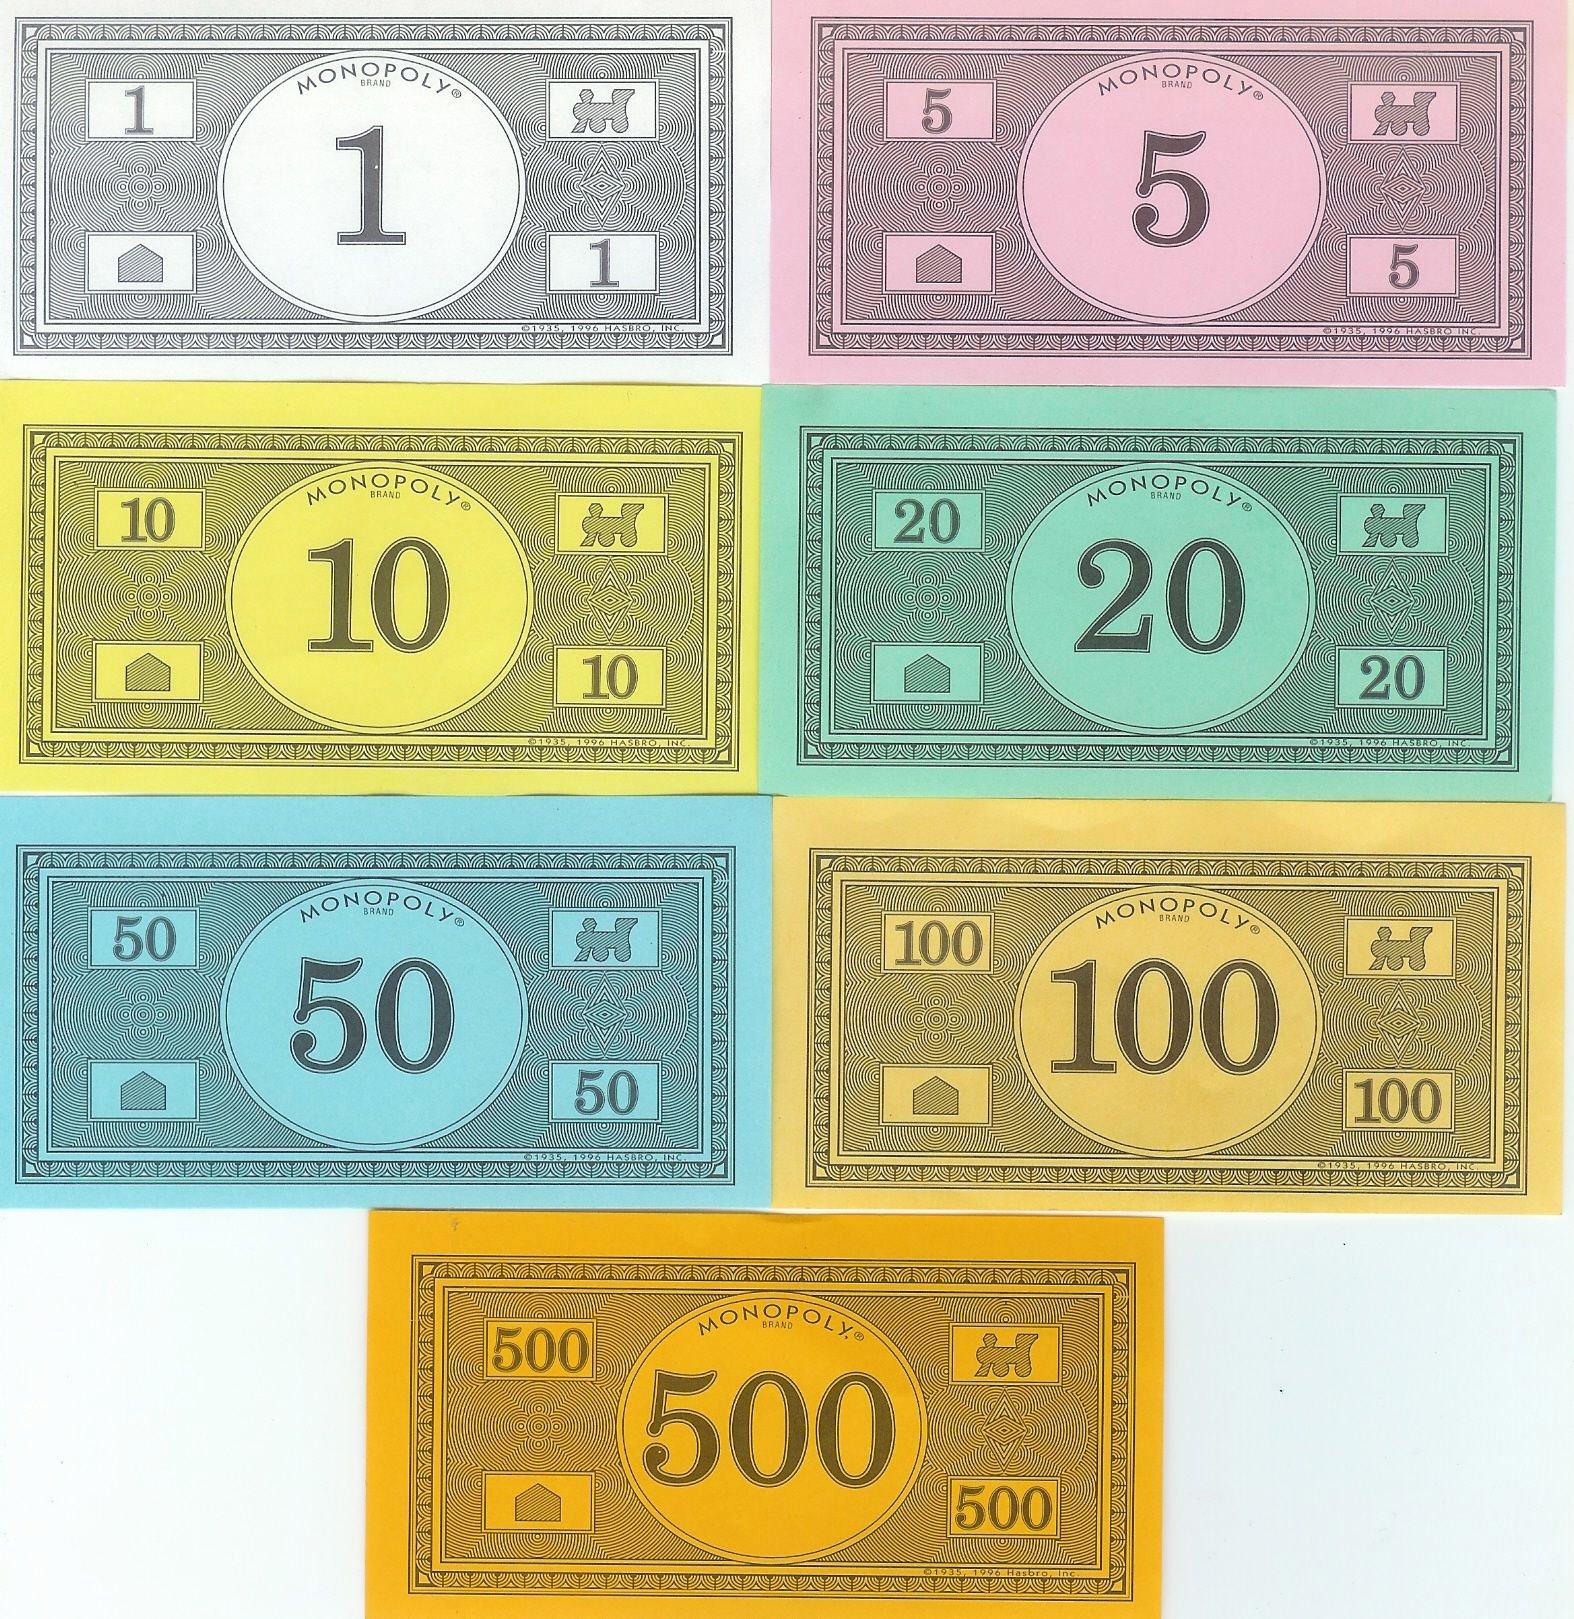 Editable Play Money Template Luxury Monopoly Money Templates Free Invitation Templates